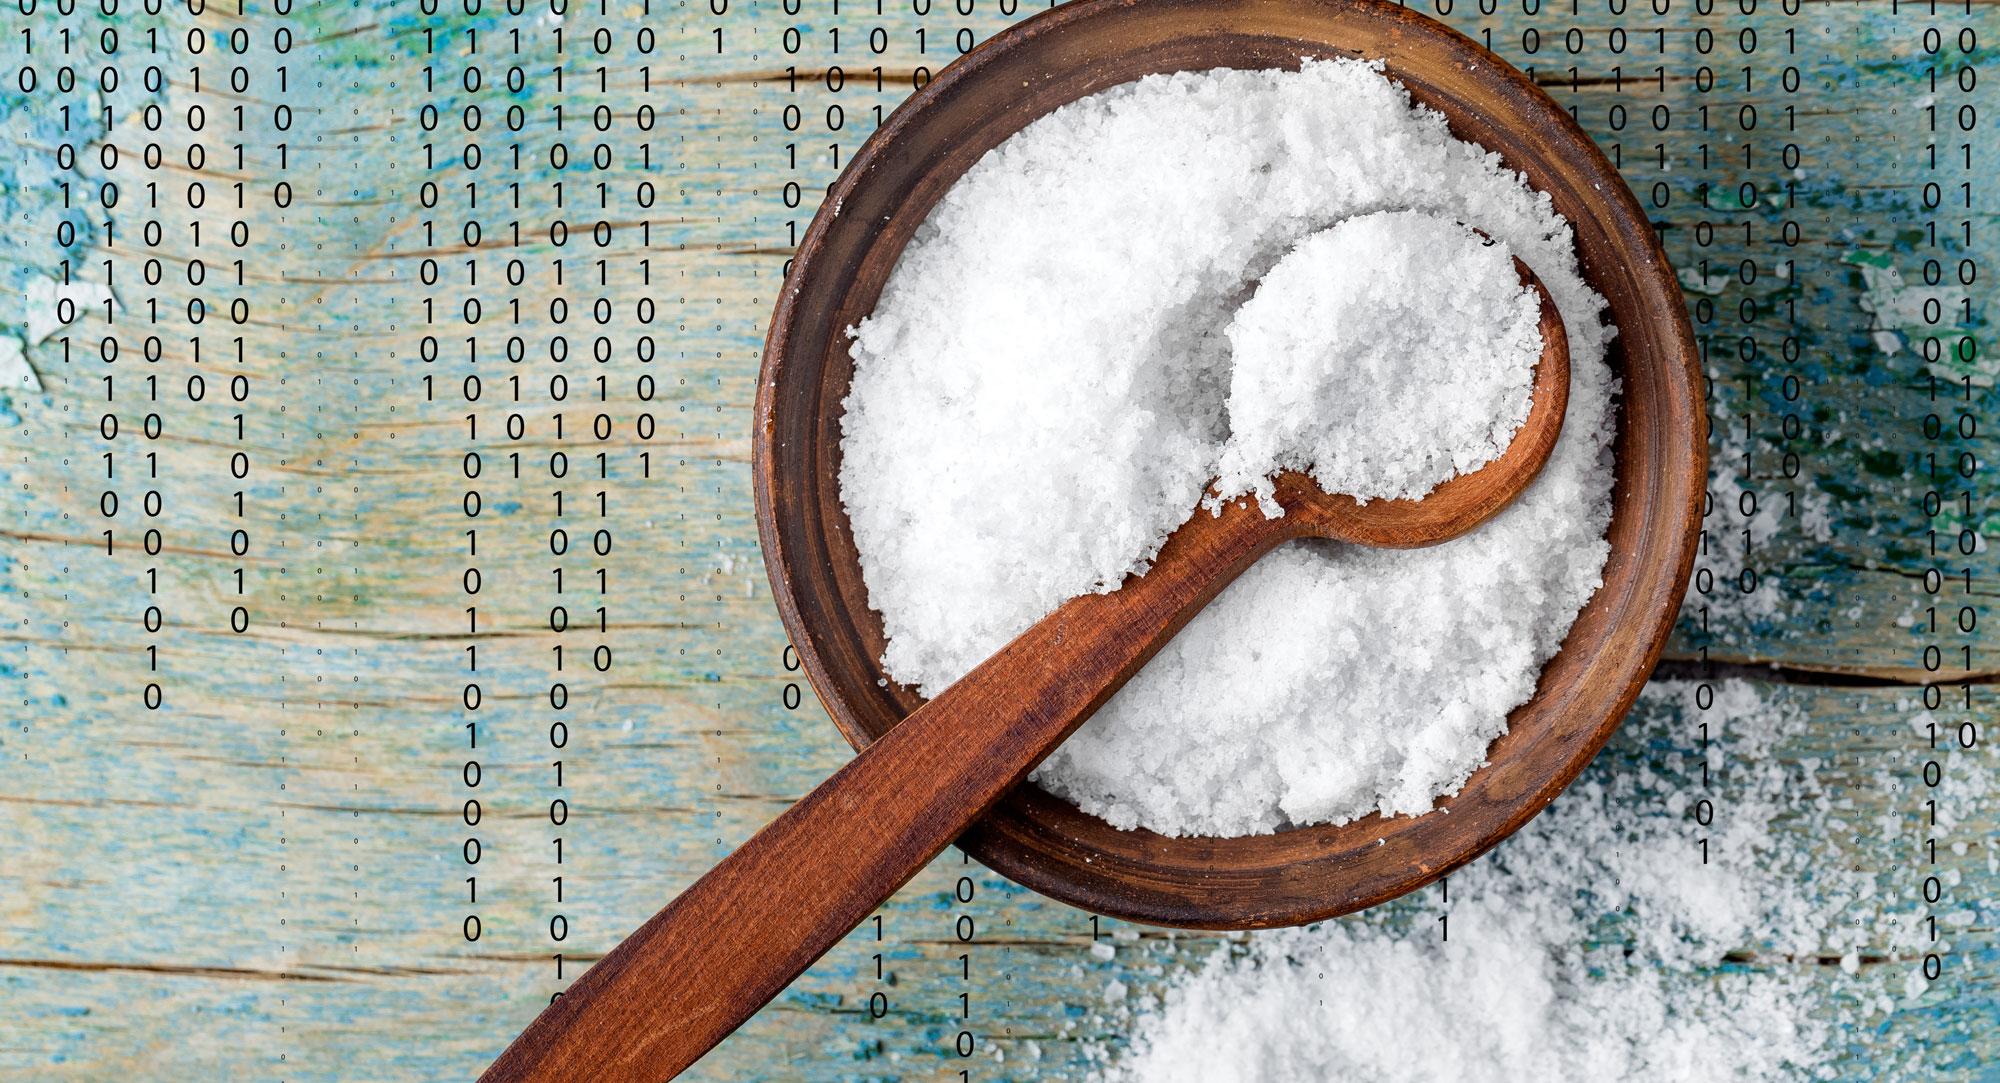 Salt exploit attacks expose underestimated threat vector: Infrastructure-as-Code tools